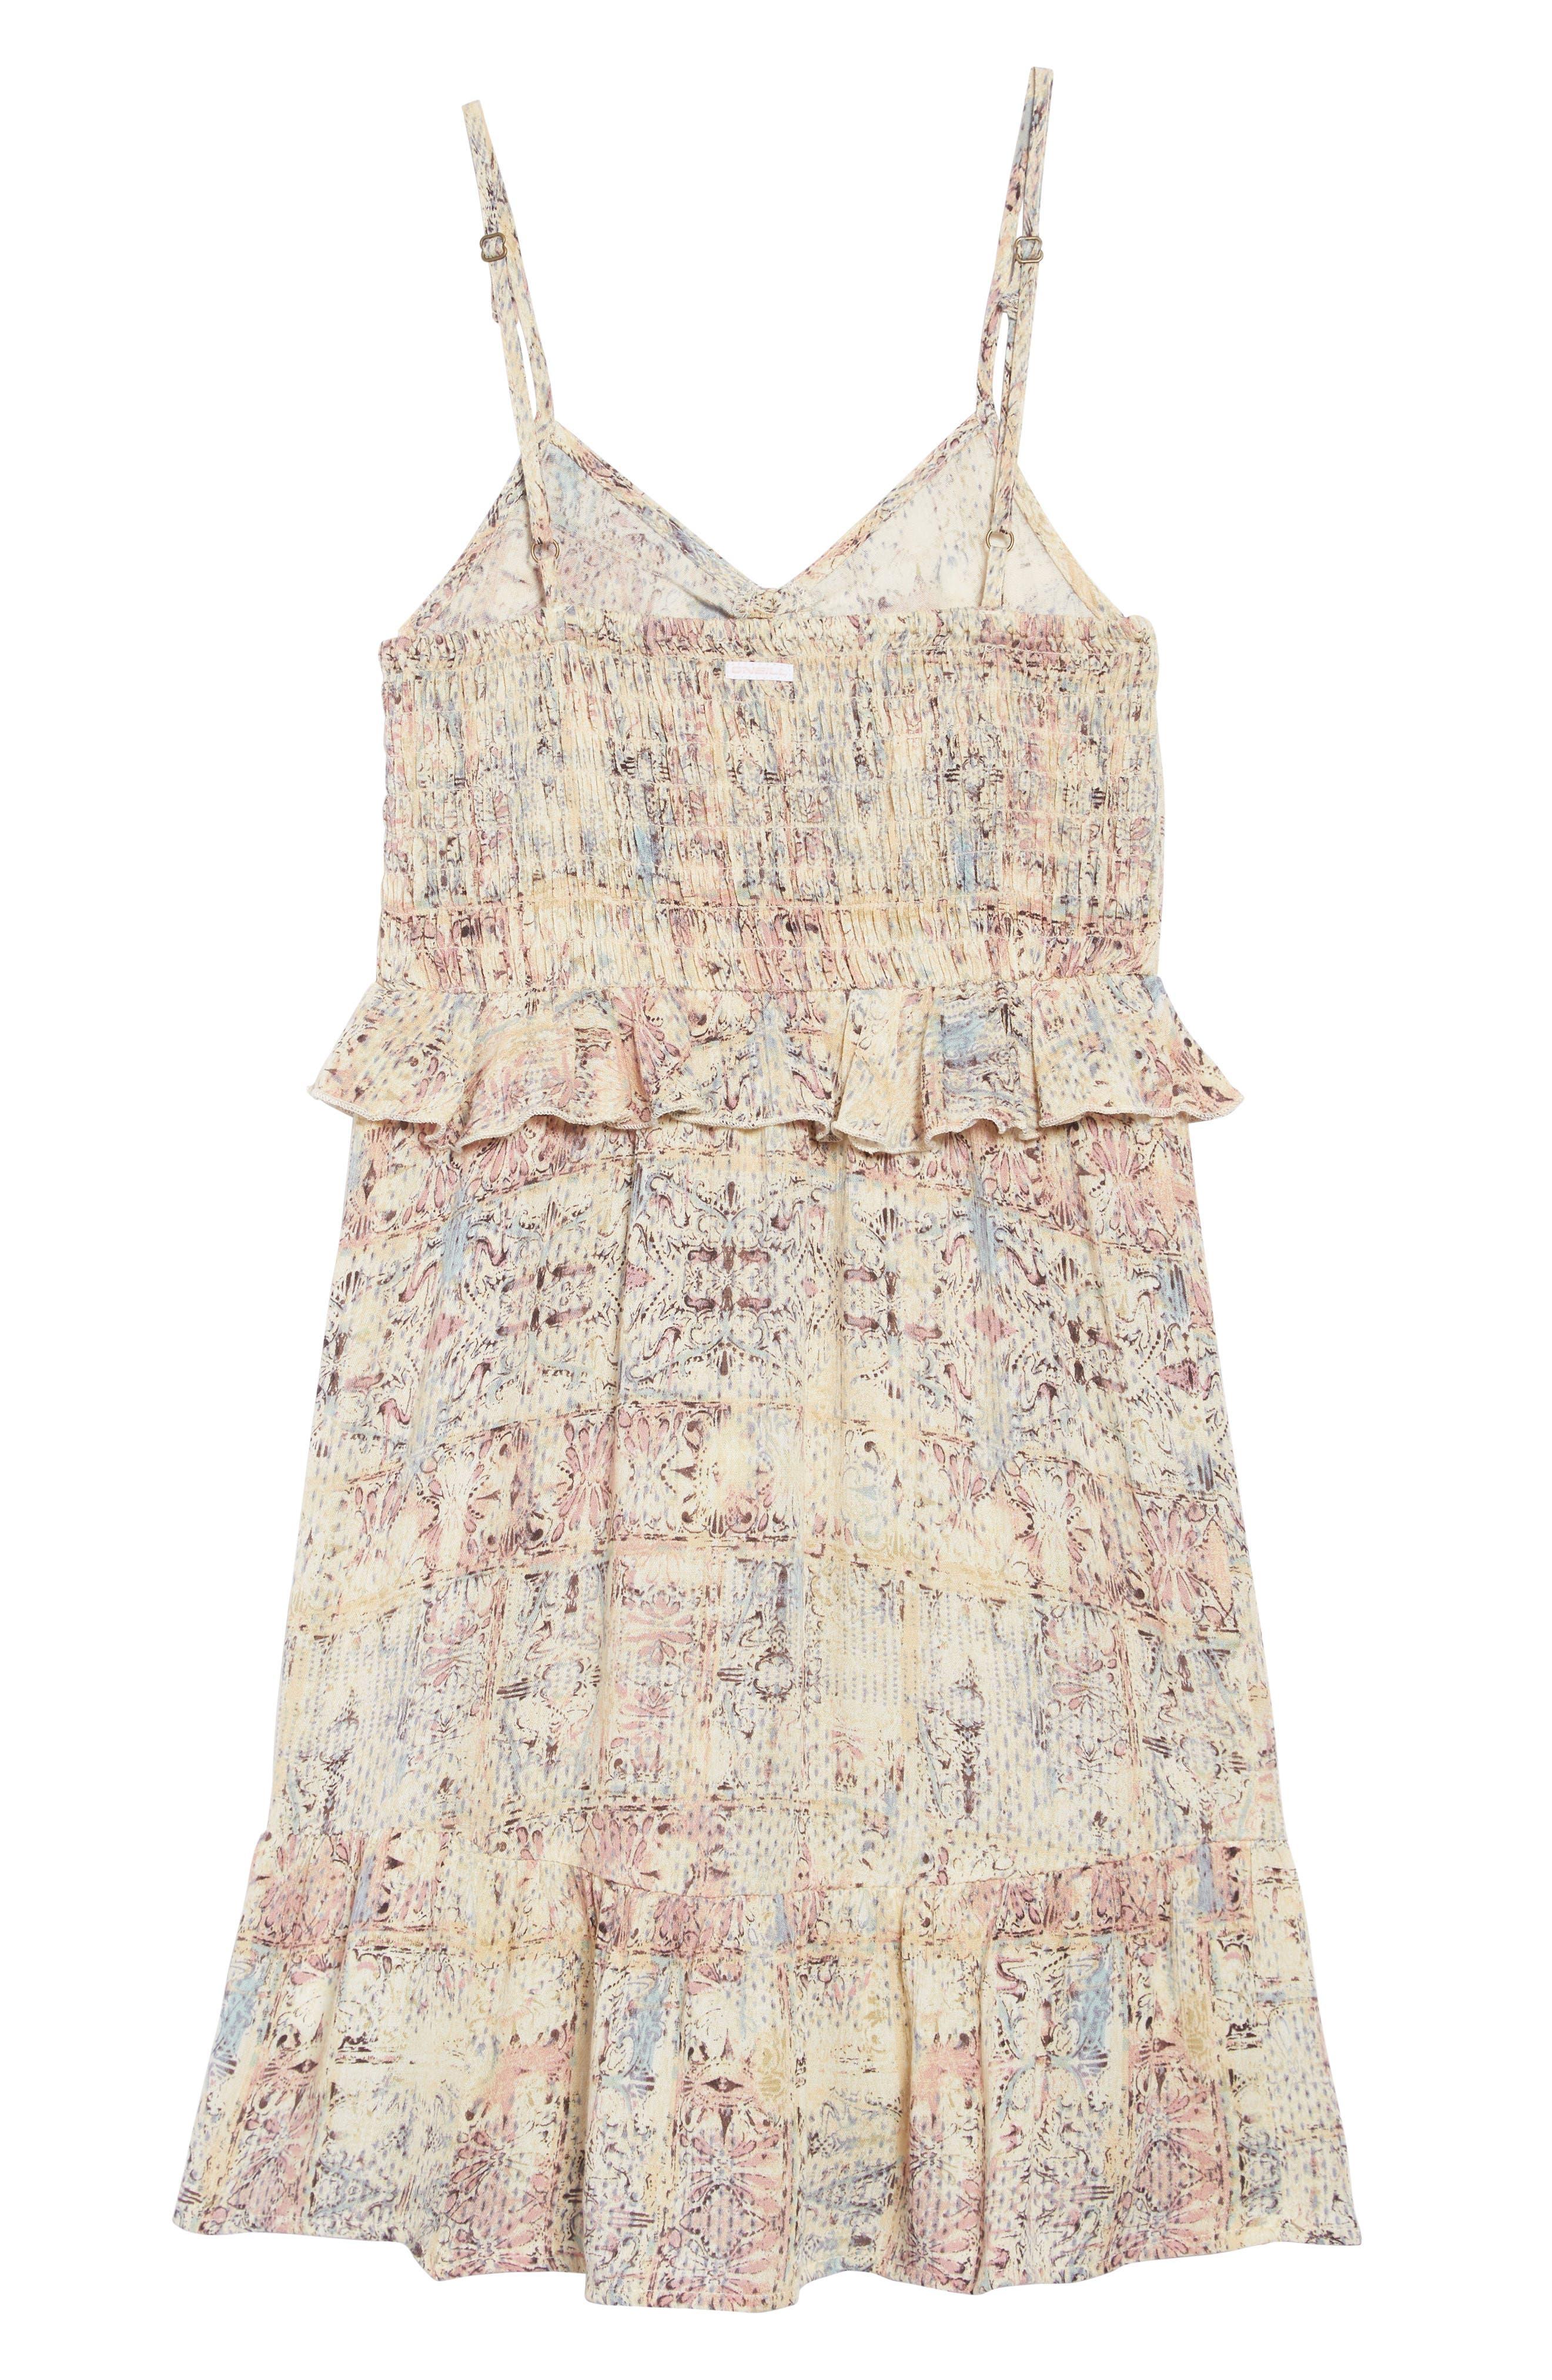 Lithia Peplum High/Low Dress,                             Alternate thumbnail 4, color,                             MULTI COLORED